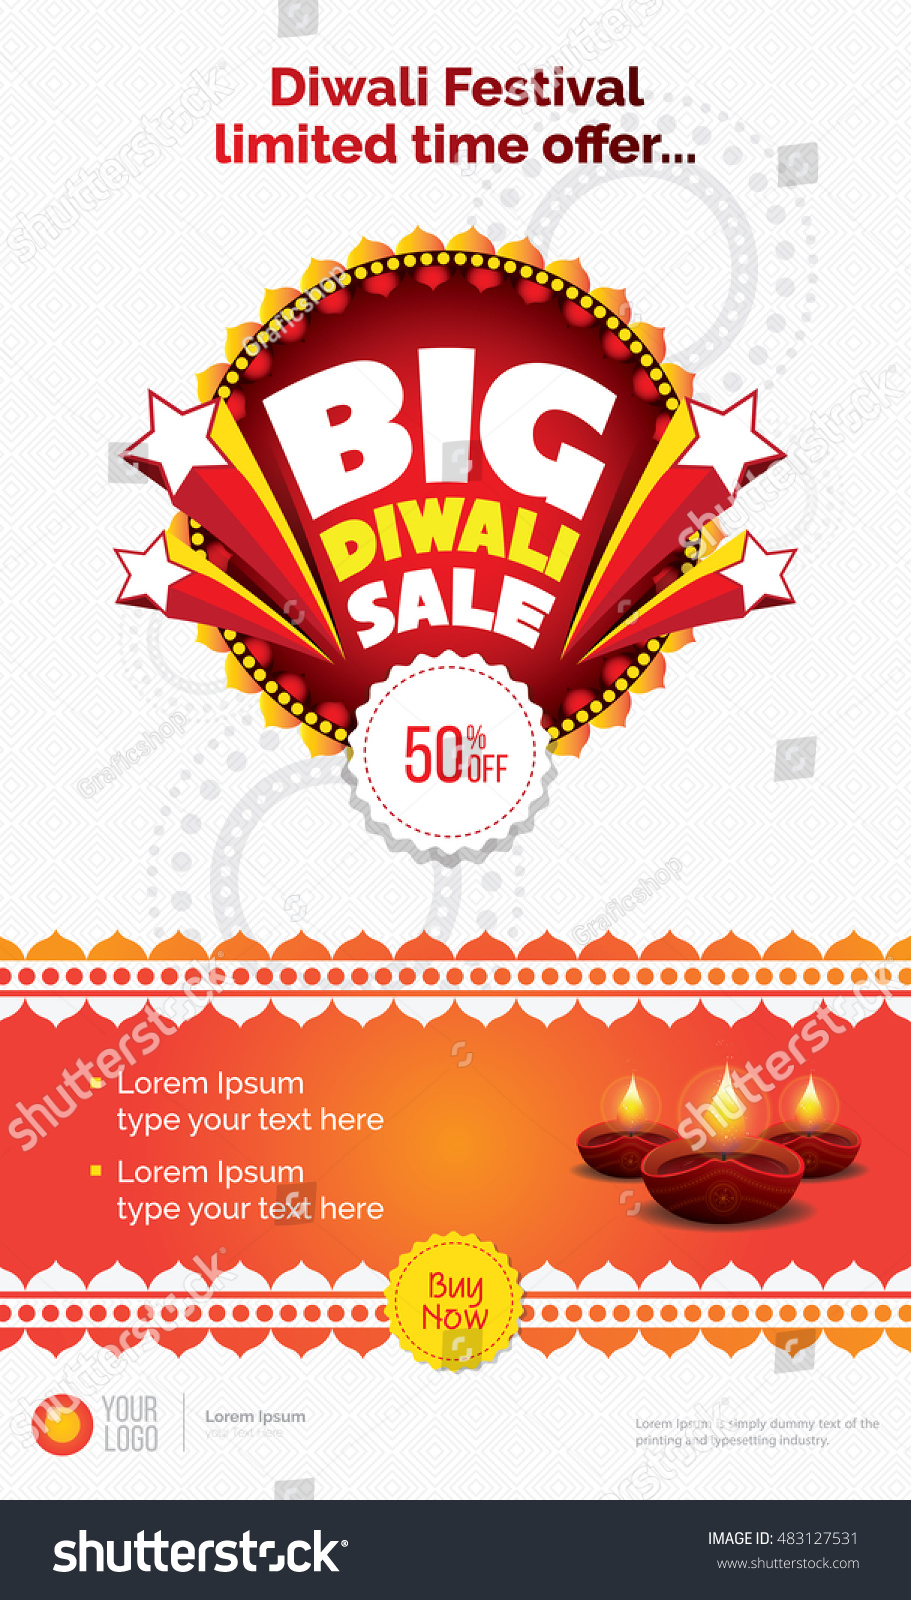 Big Diwali Sale Template Diwali Festival Stock Vector (Royalty Free ...